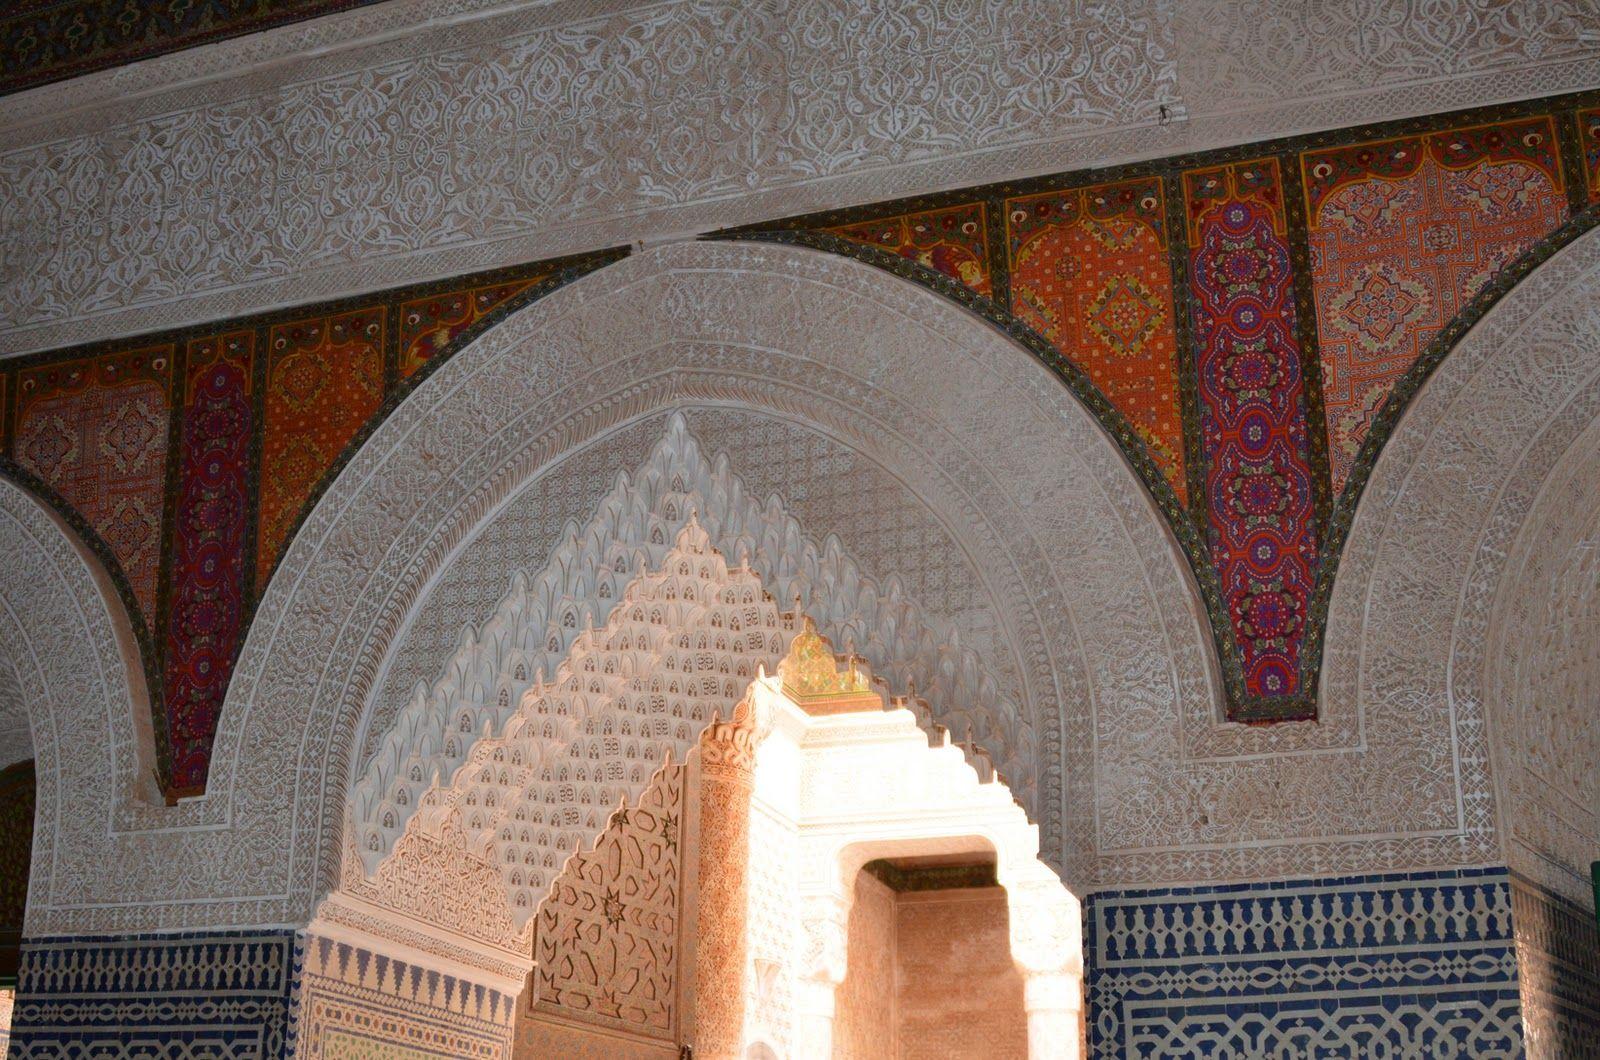 Zelij (mosaic), plaster, fabric panels. Telouet, Morocco. (Photo by Laini Taylor)